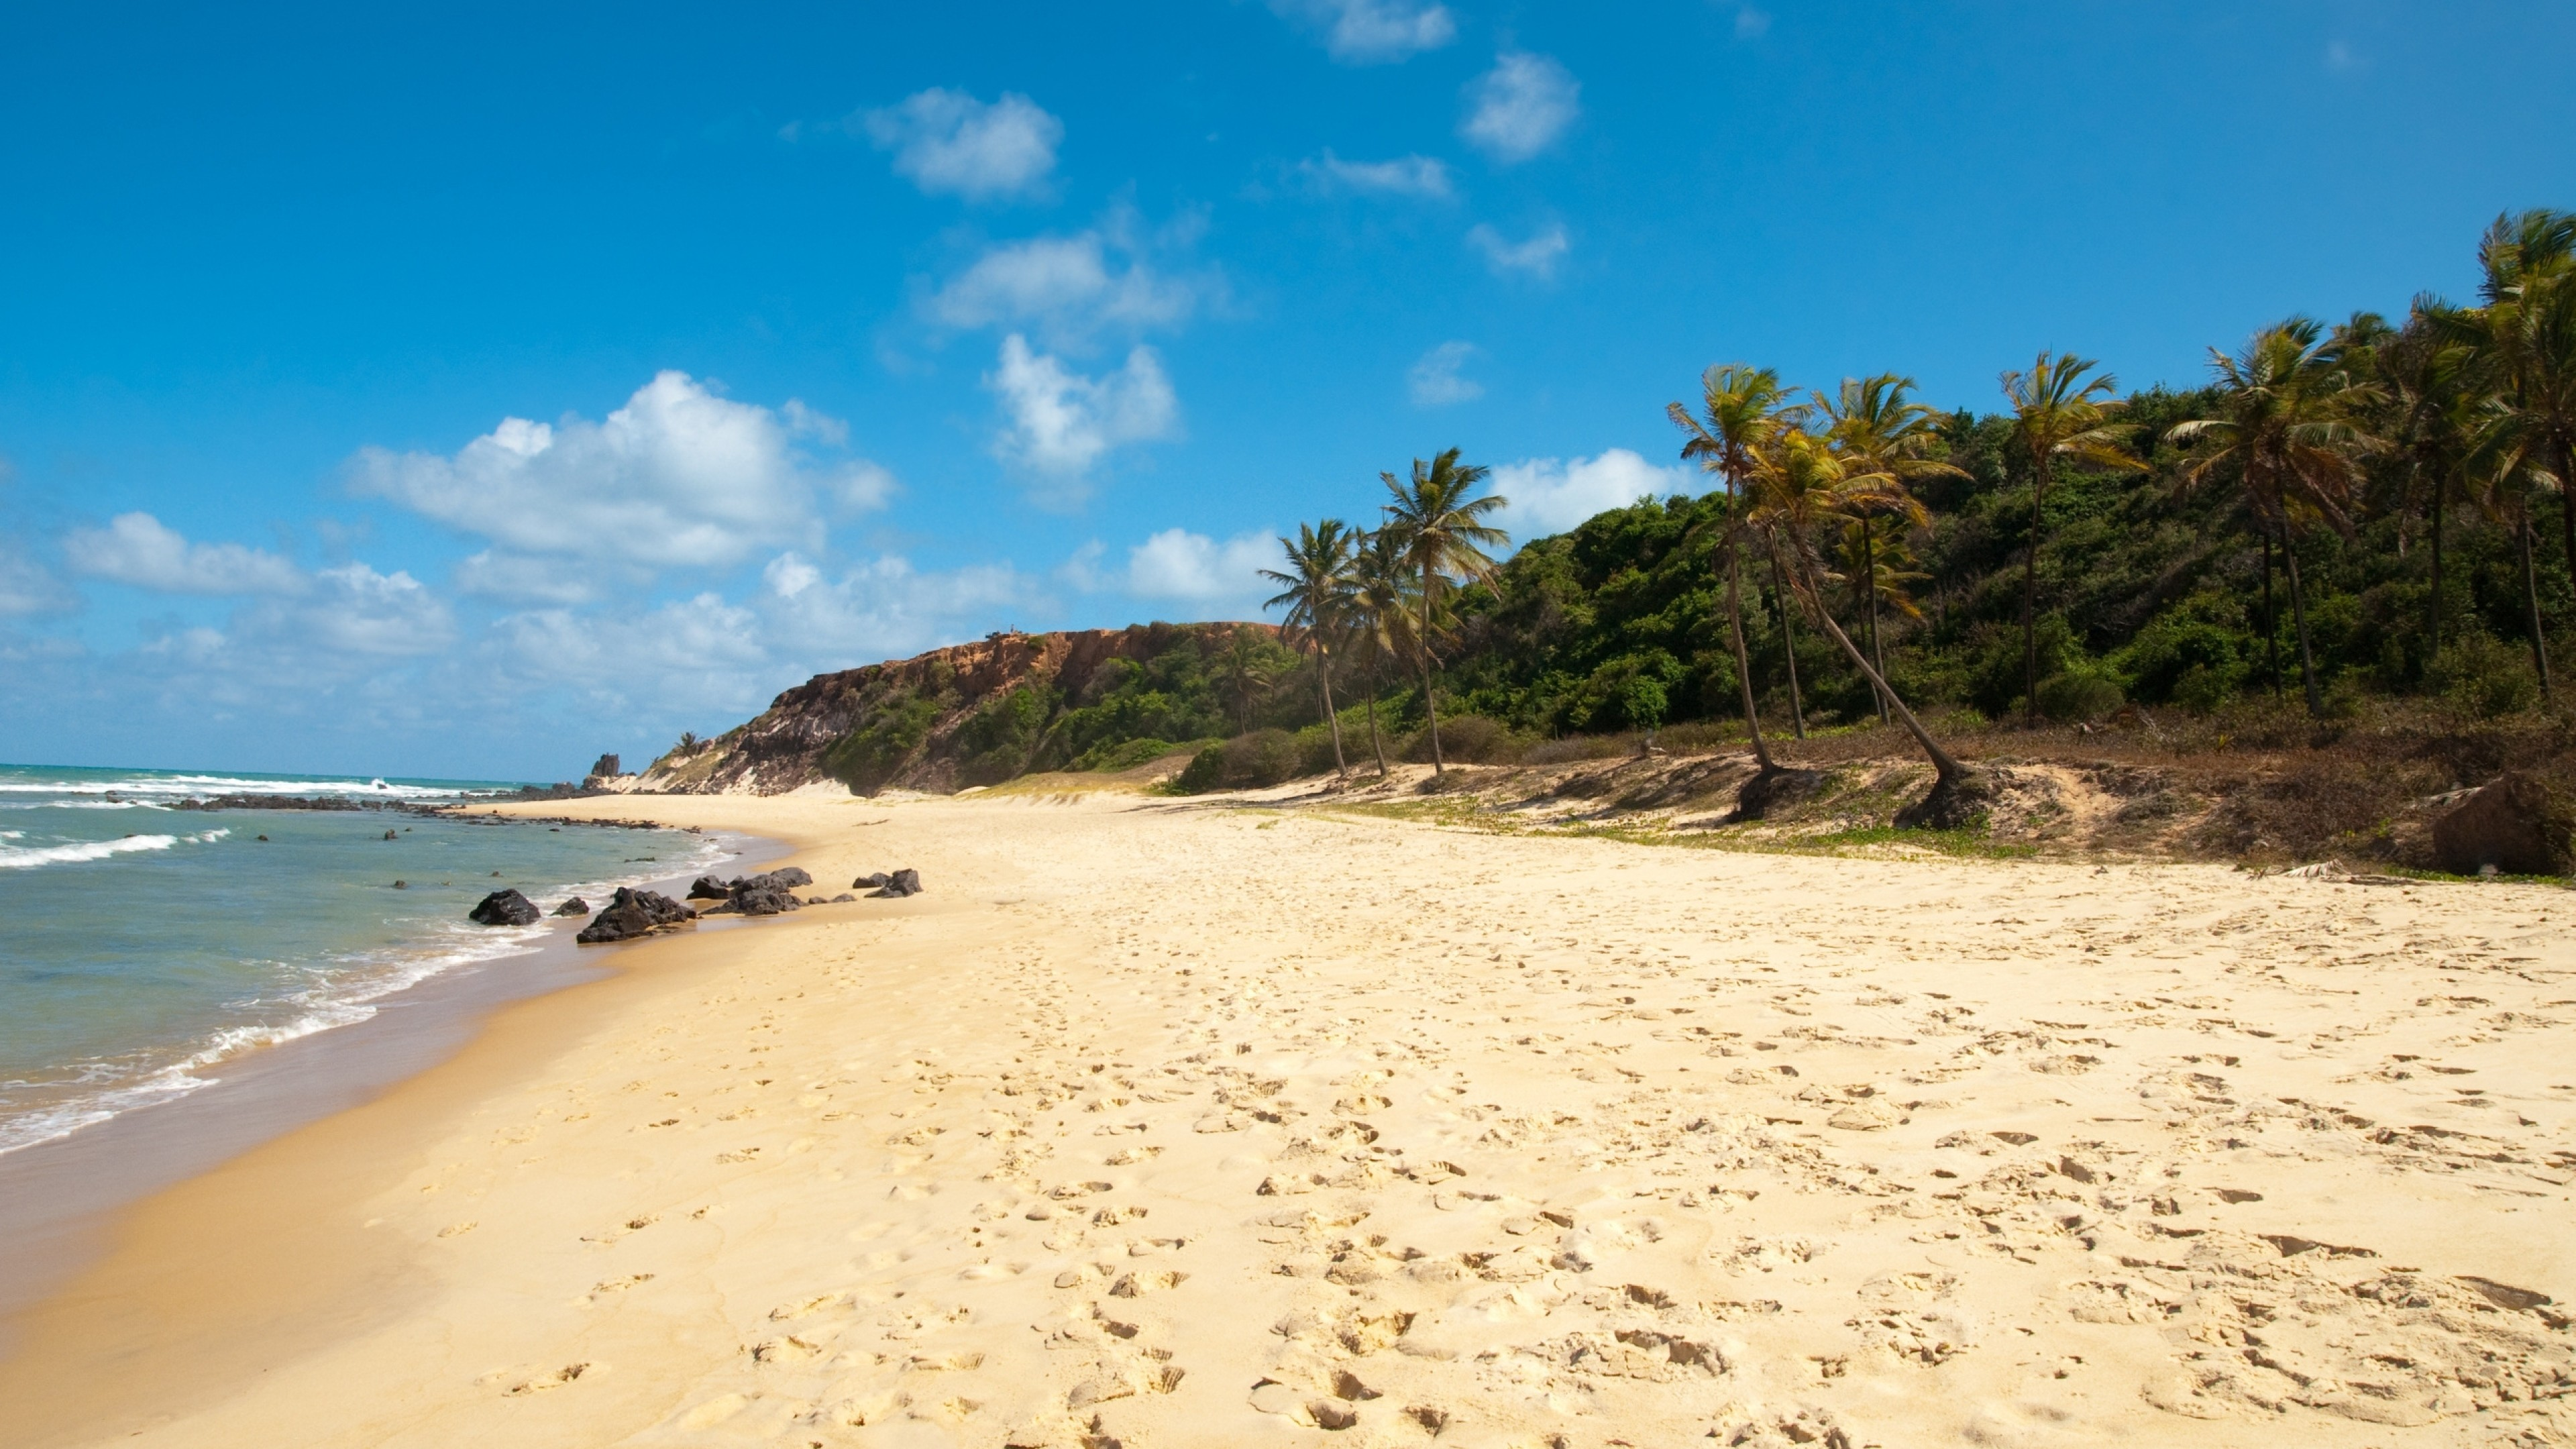 Wallpaper beach, sand, coast, traces, palm trees, resort, mexico